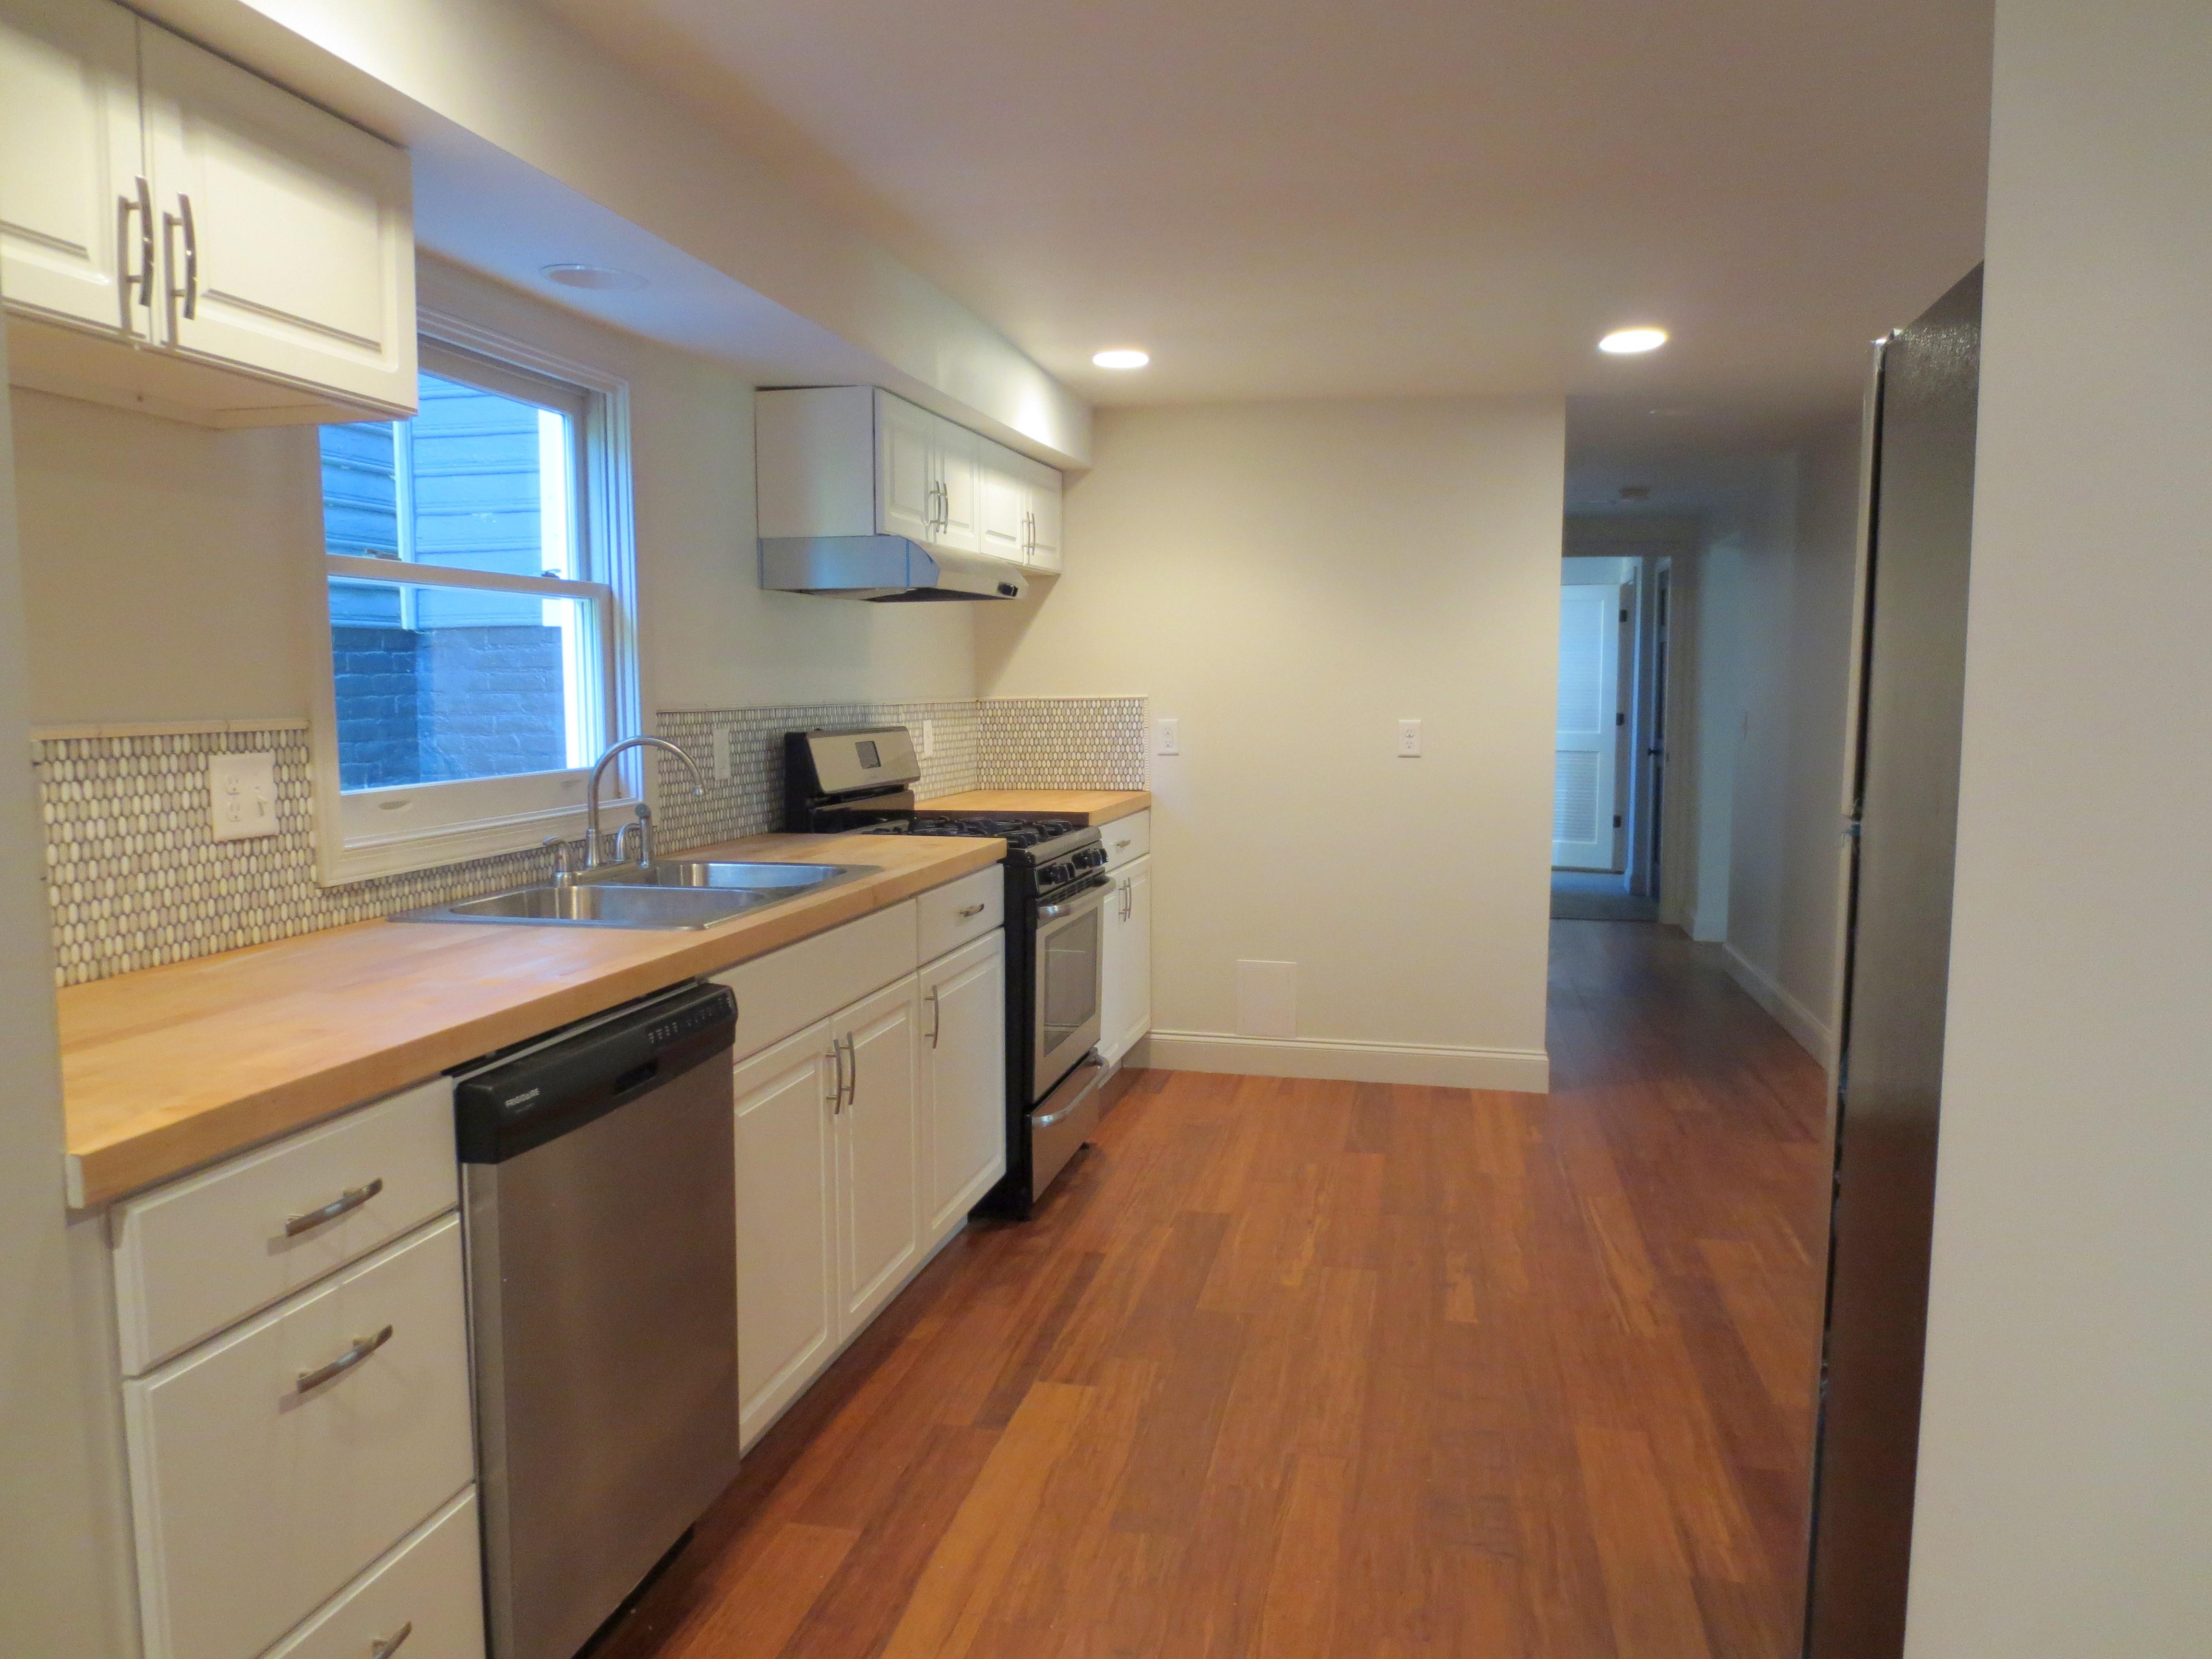 The Landmark restored apartment kitchen